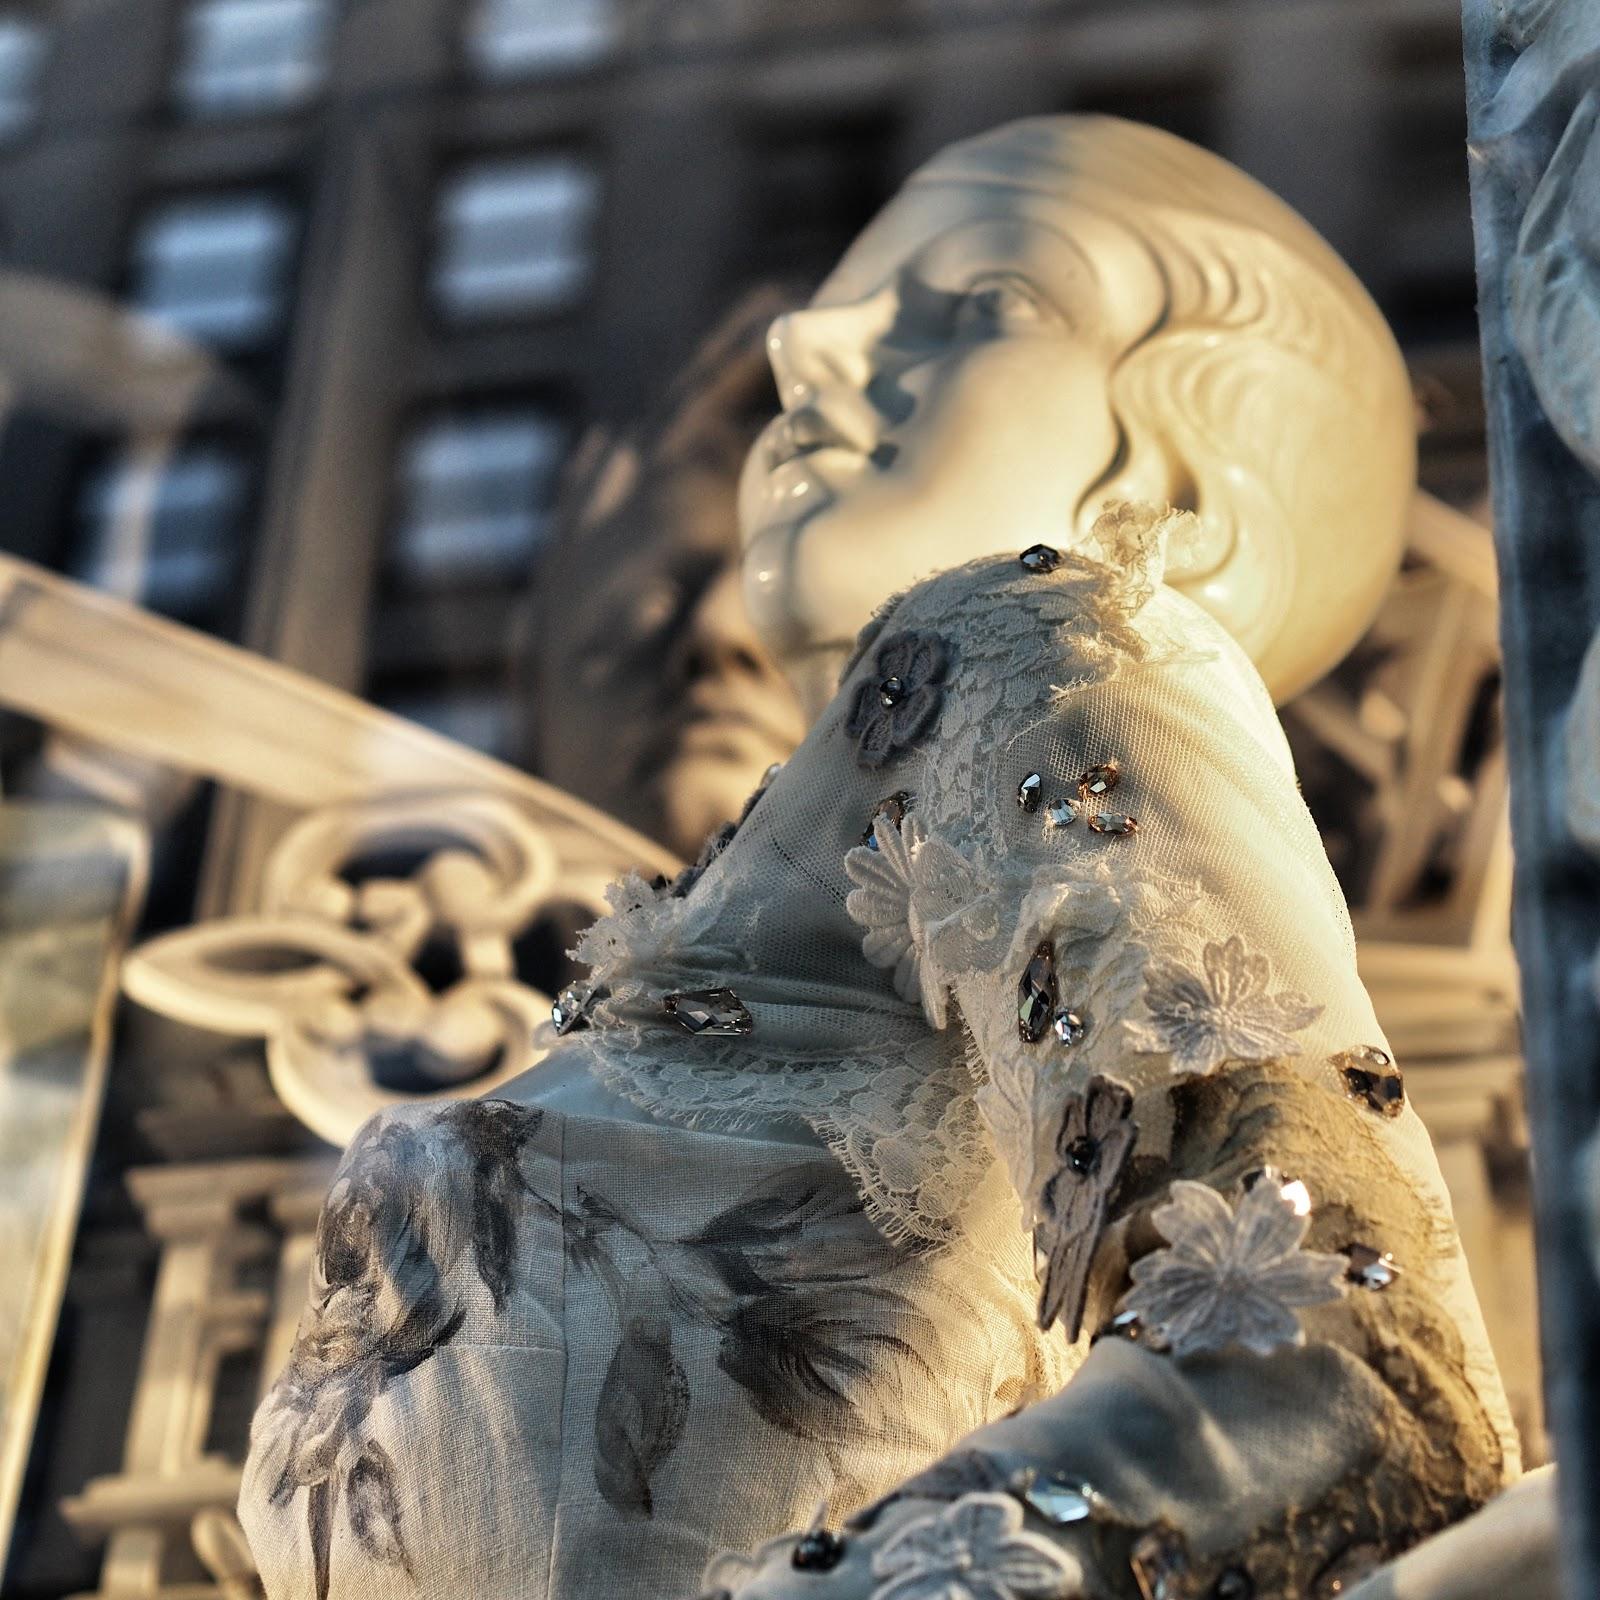 Porcelain #porcelain #bgwindows #windowwatchers #holidaywindows #5thavenuewindows #NYC  #holidays #besttimeoftheyear #nyc ©2014 Nancy Lundebjerg